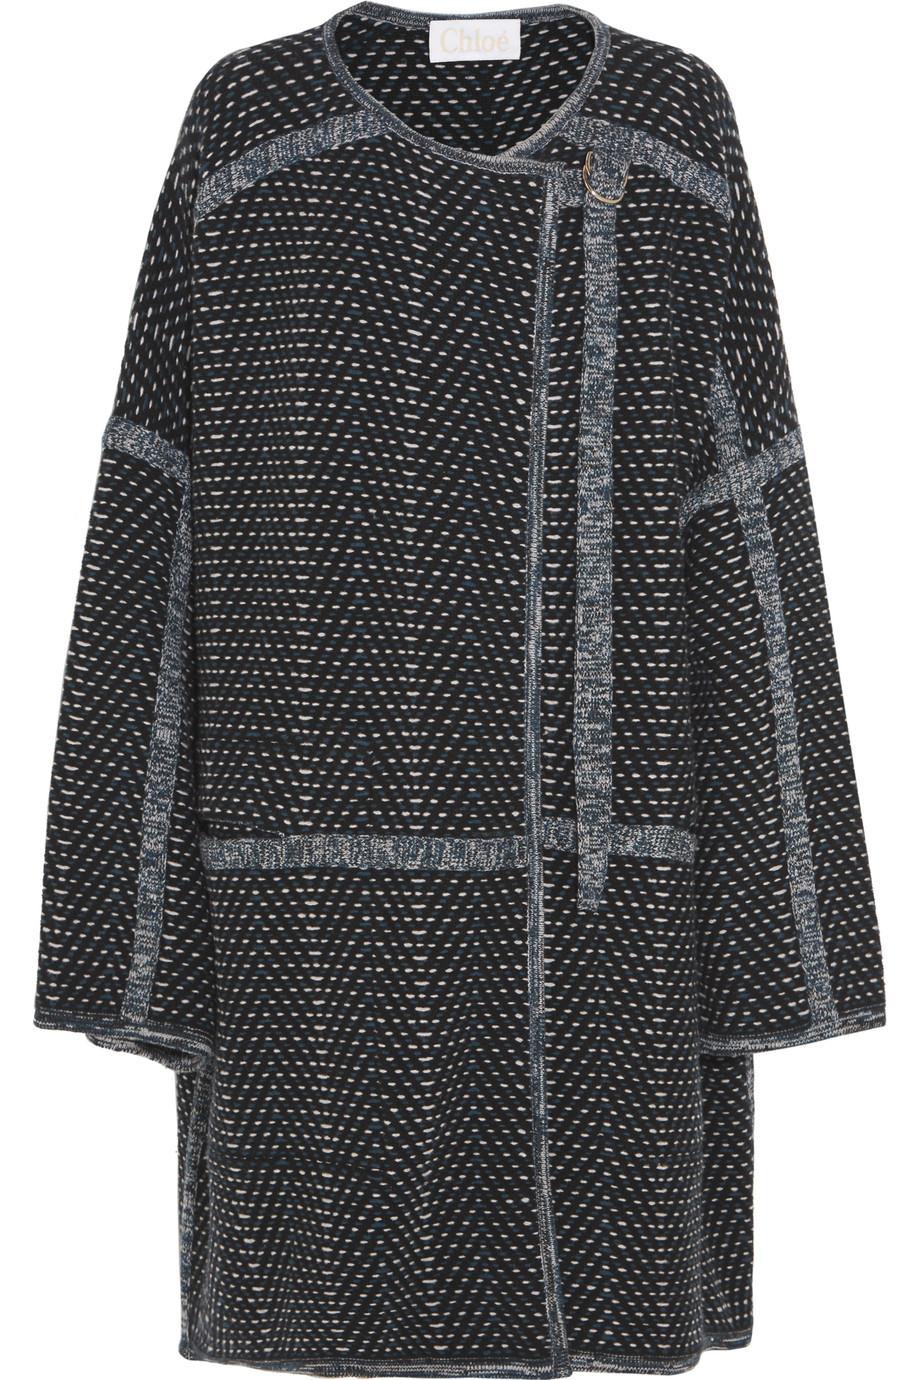 Chloé Oversized Wool and Cashmere-Blend Bouclé Coat, Navy, Women's, Size: 42